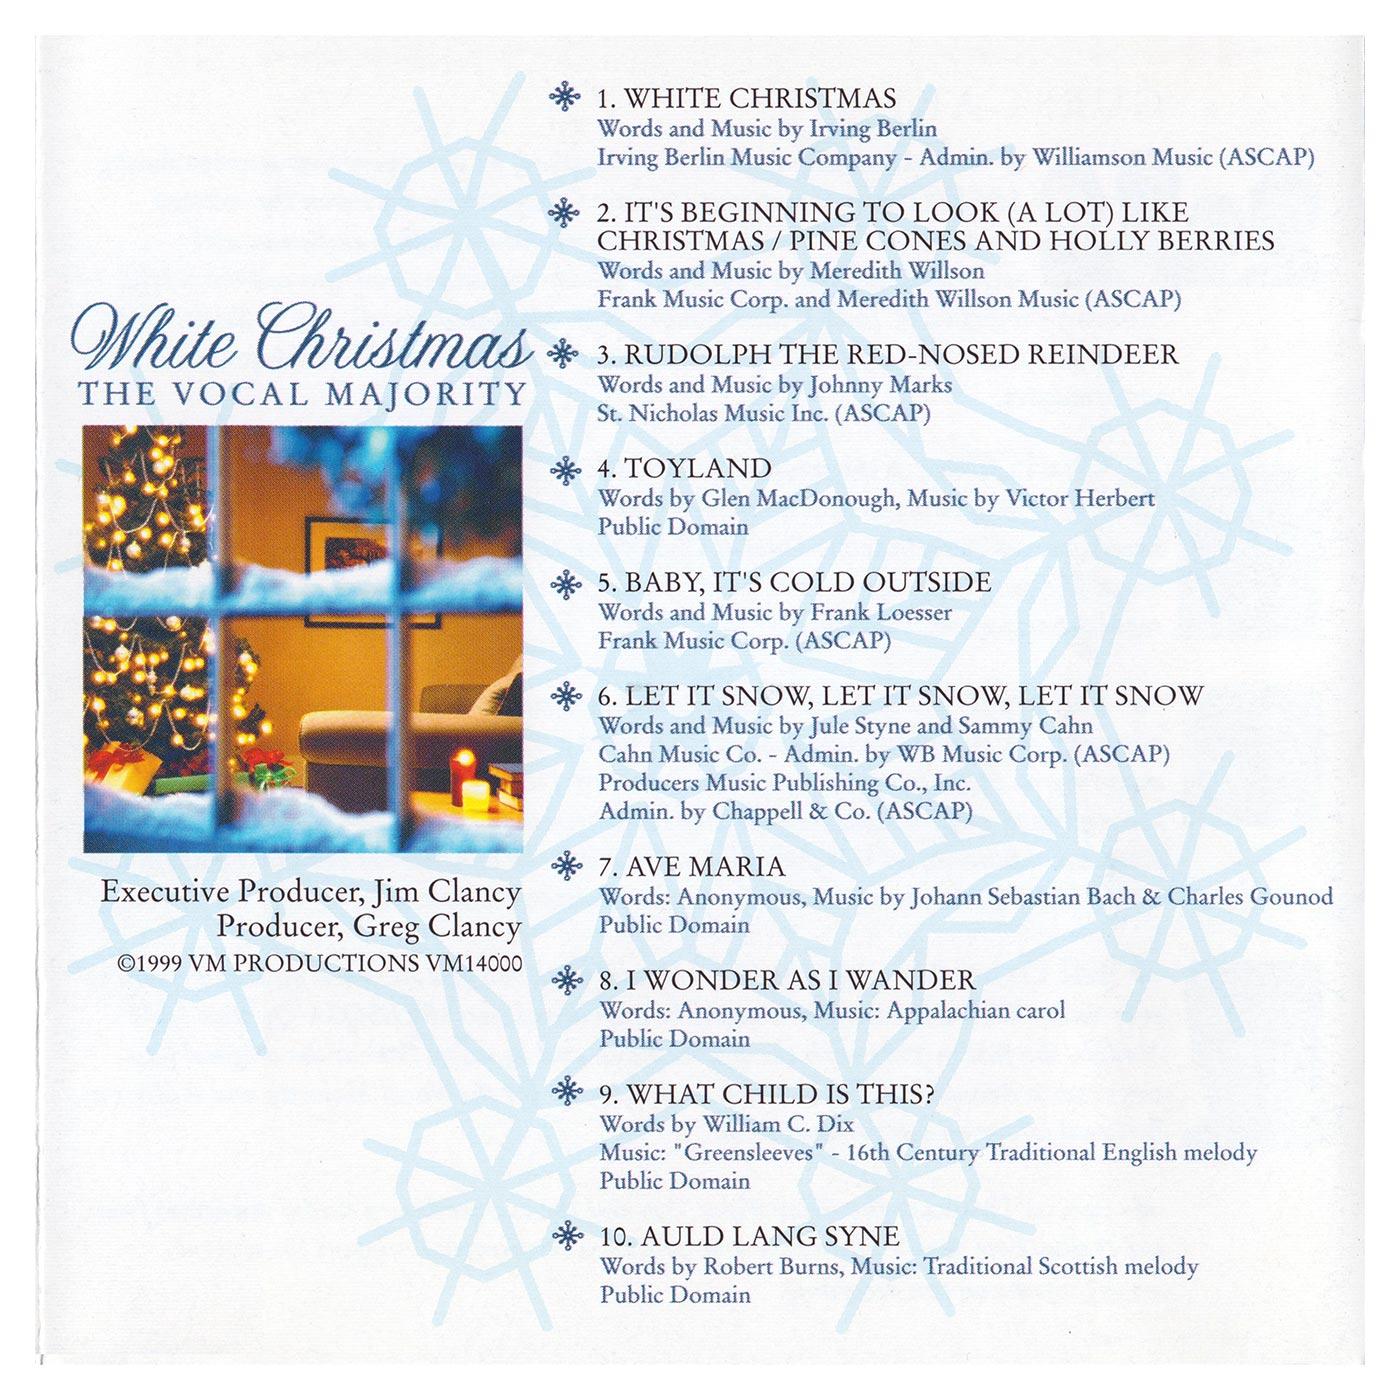 Booklet Outside Back Panel: White Christmas